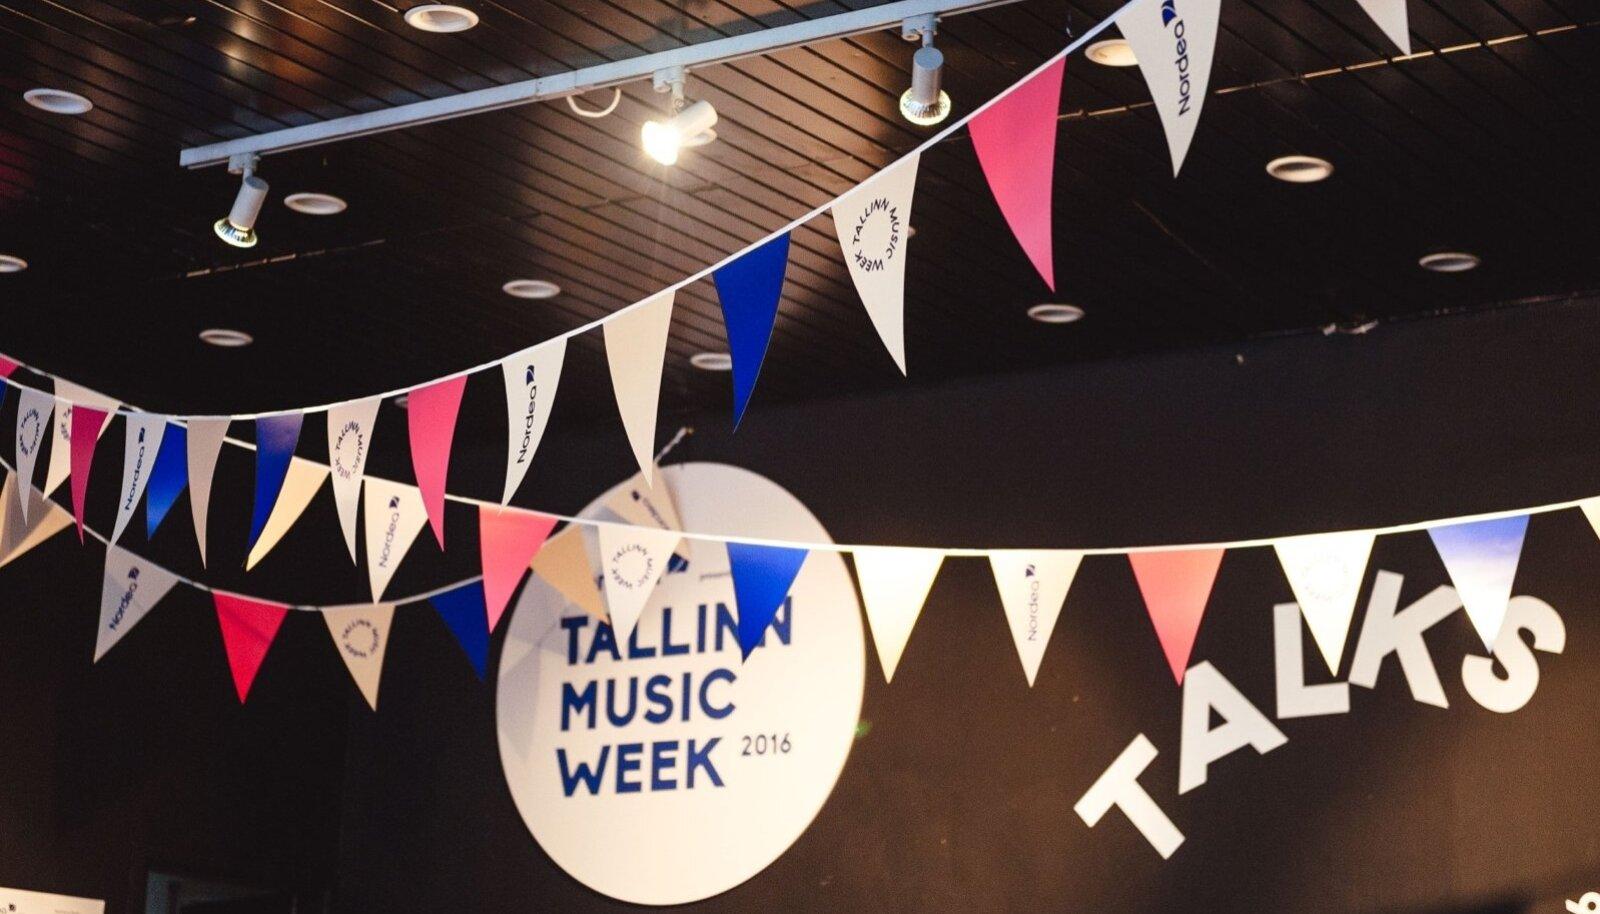 Tallinn Music Week 2. päev